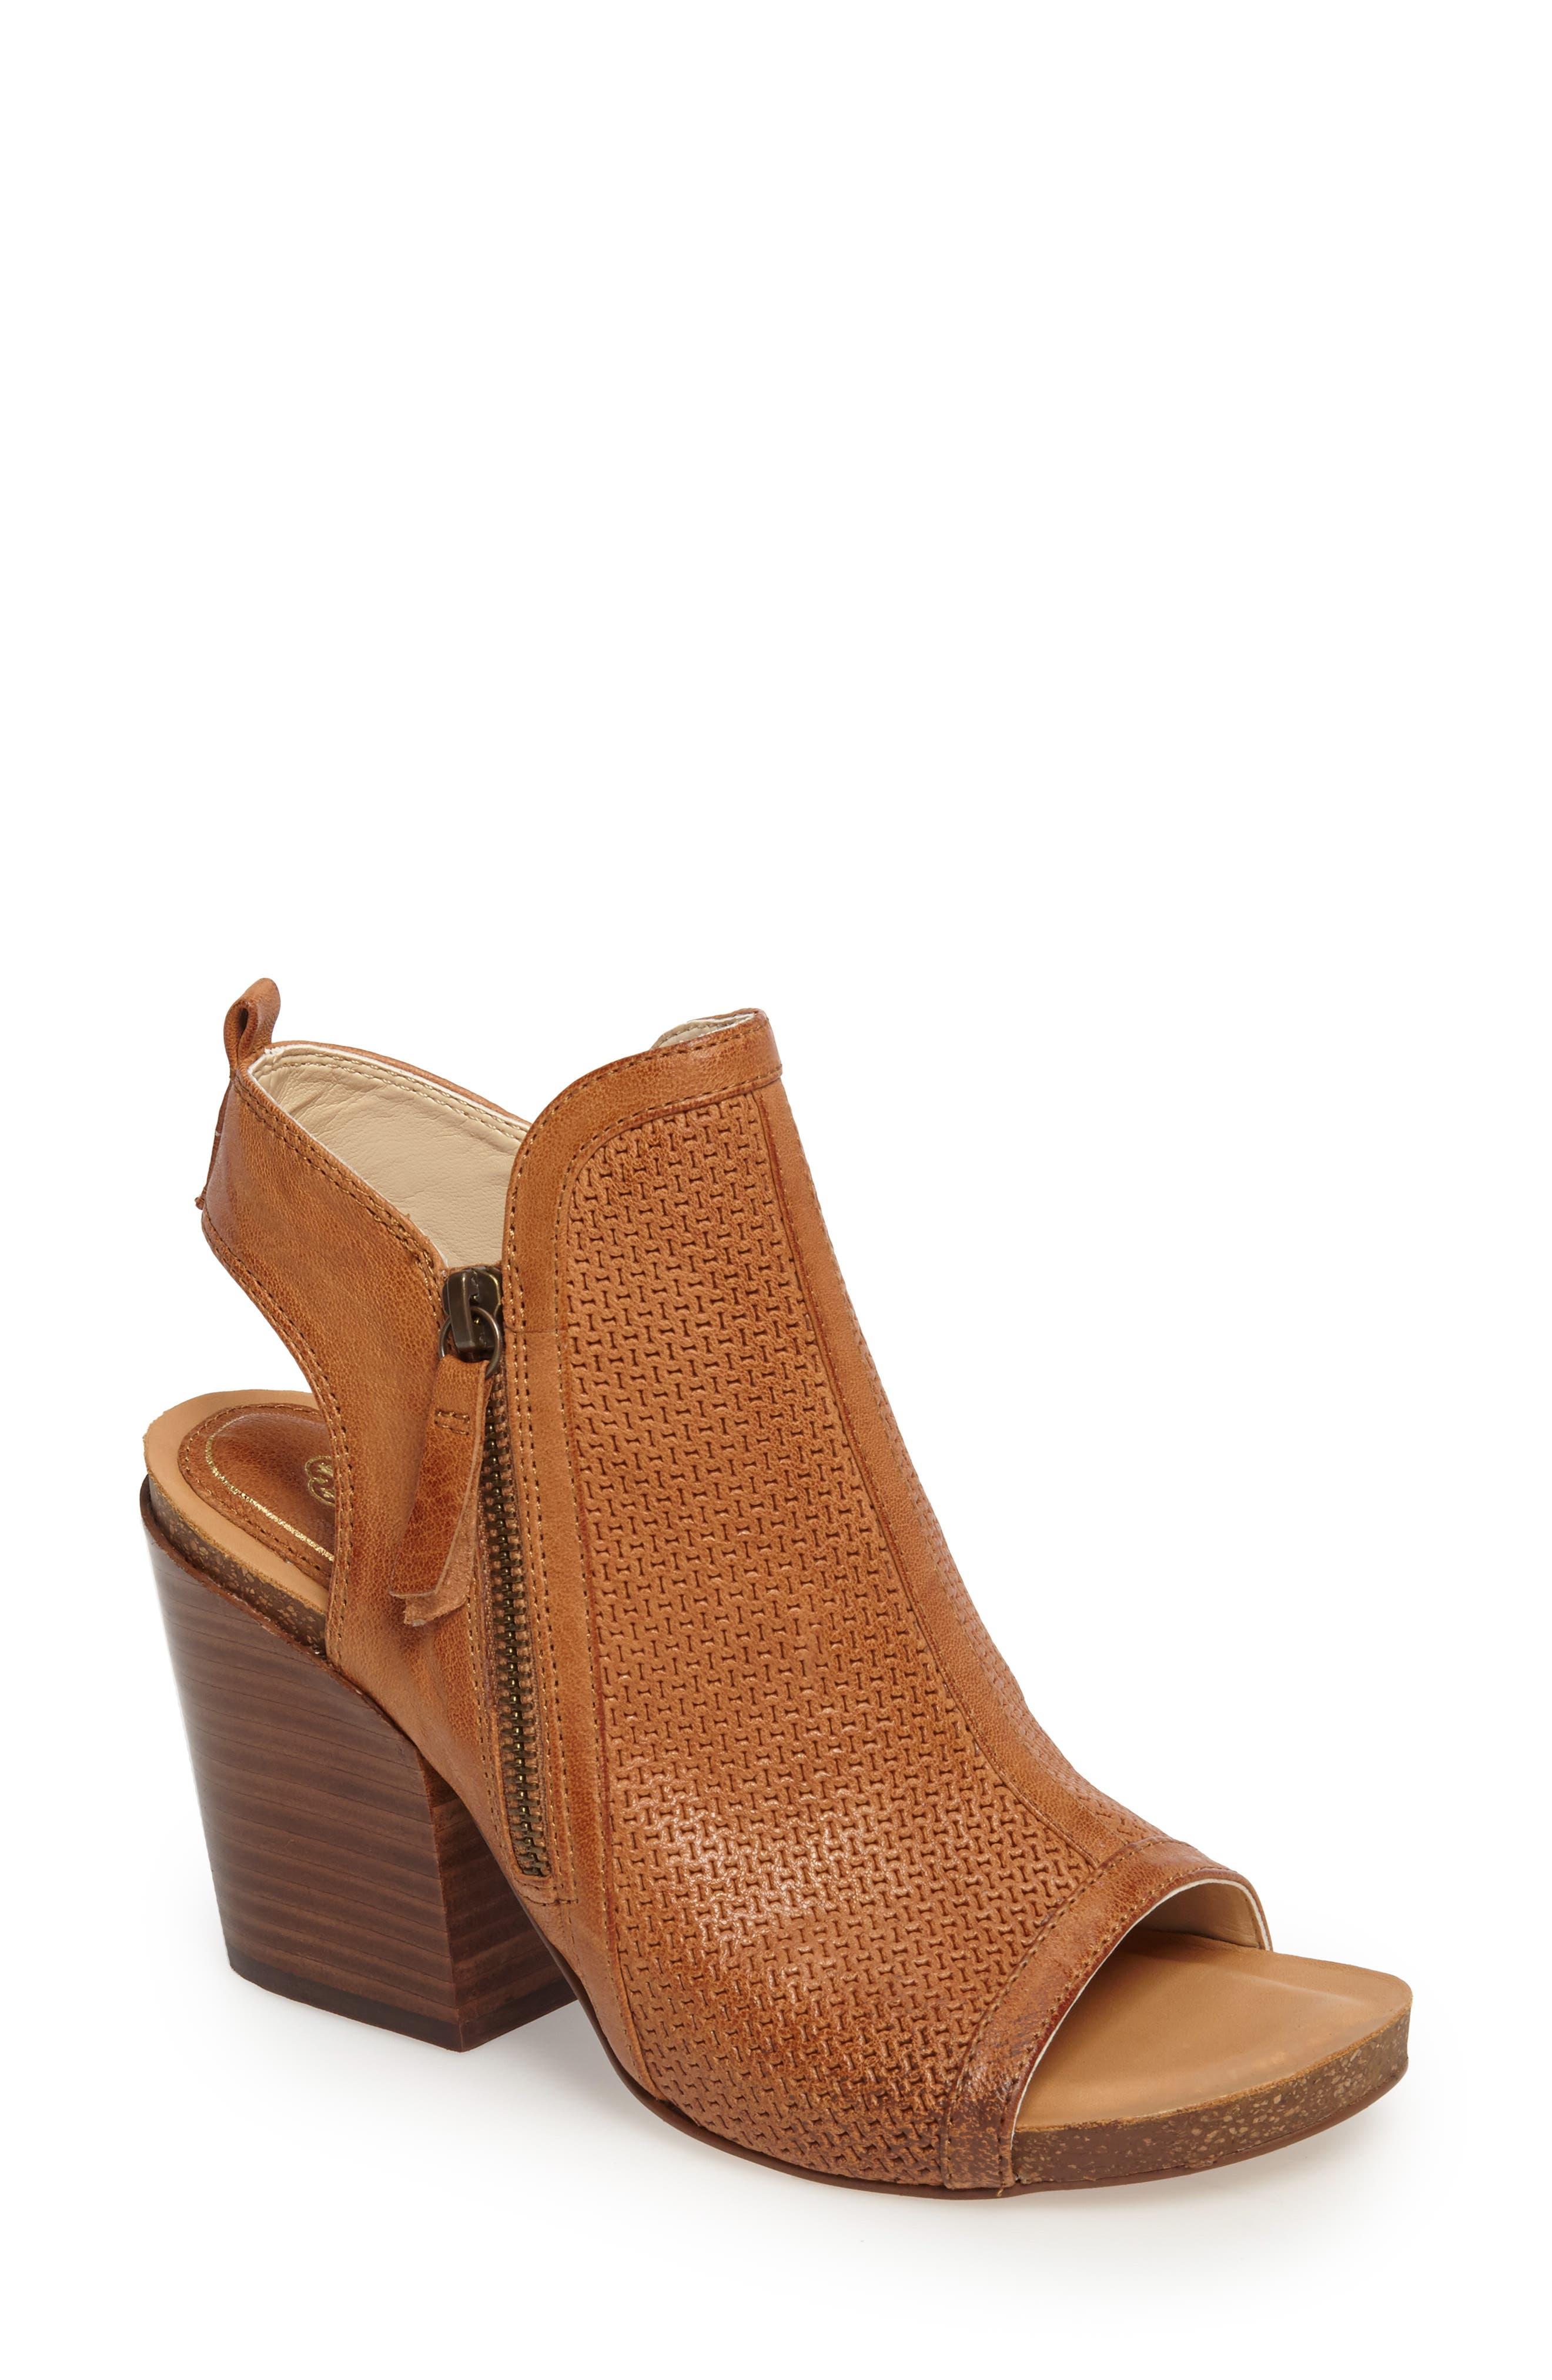 Iliana Open Toe Bootie,                             Main thumbnail 1, color,                             Luggage Leather